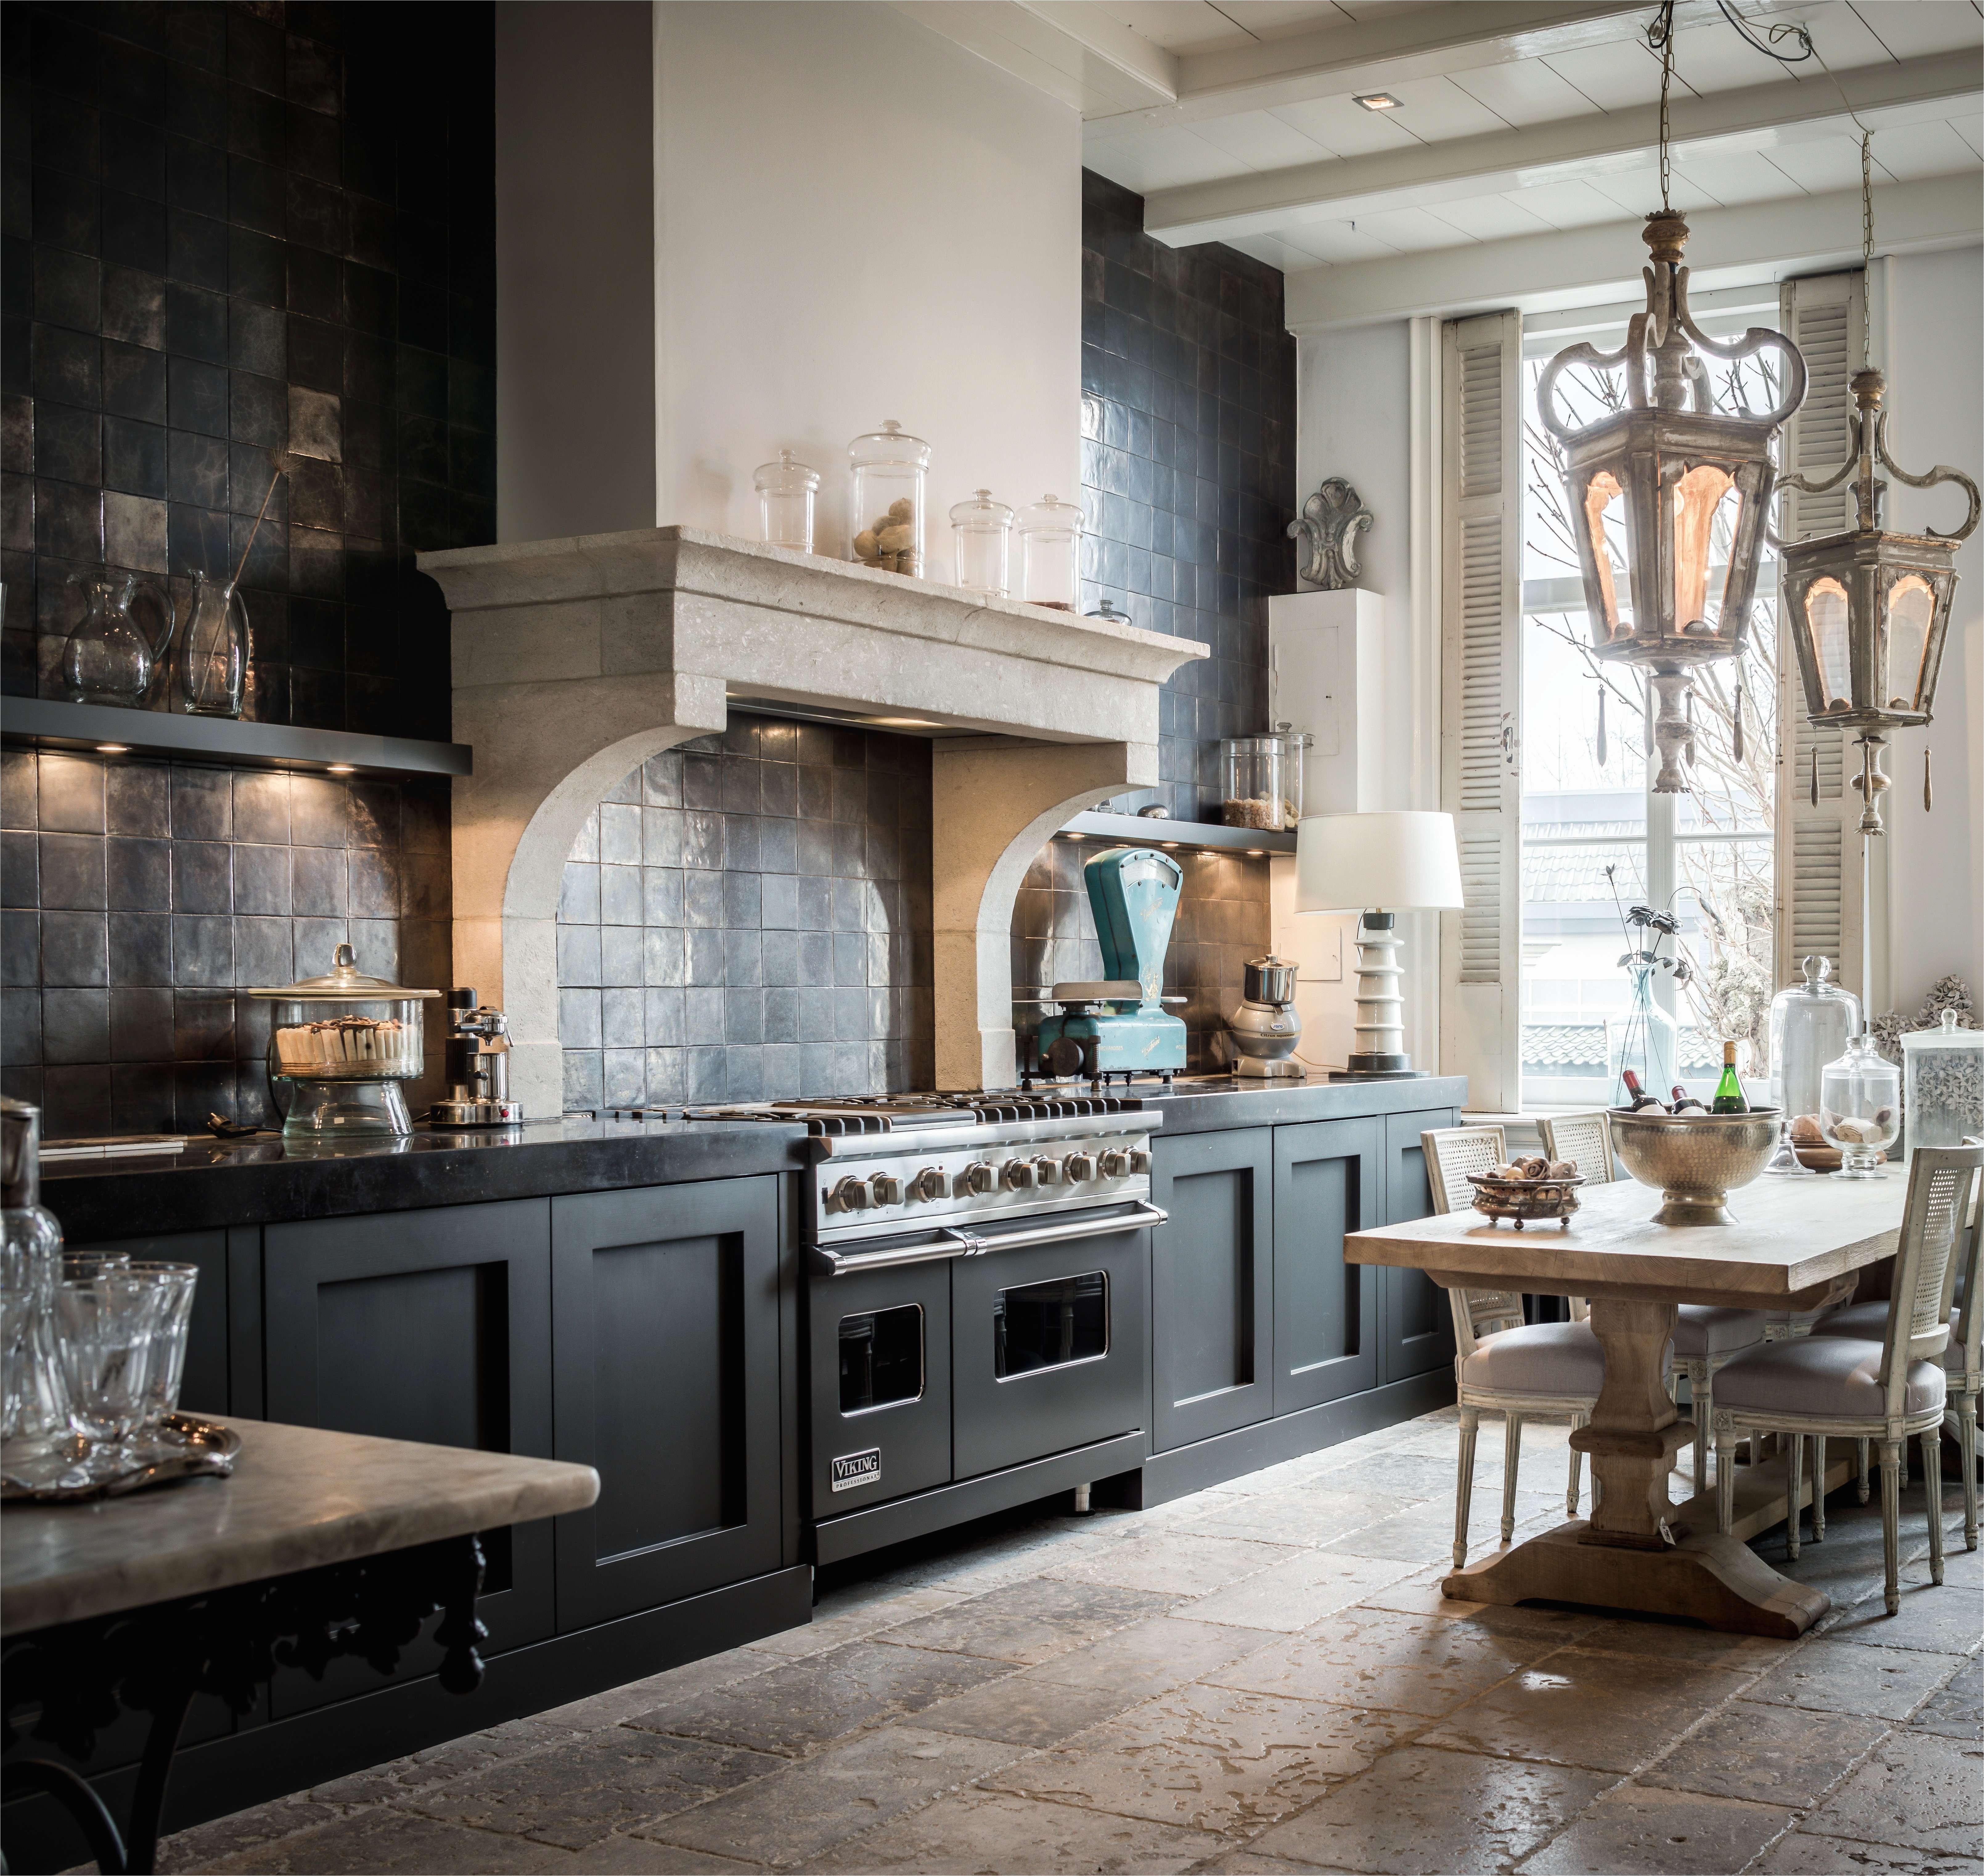 Small Kitchen Decorating Ideas s 34 Best Storage Ideas for Small Kitchens Trinitycountyfoodbank